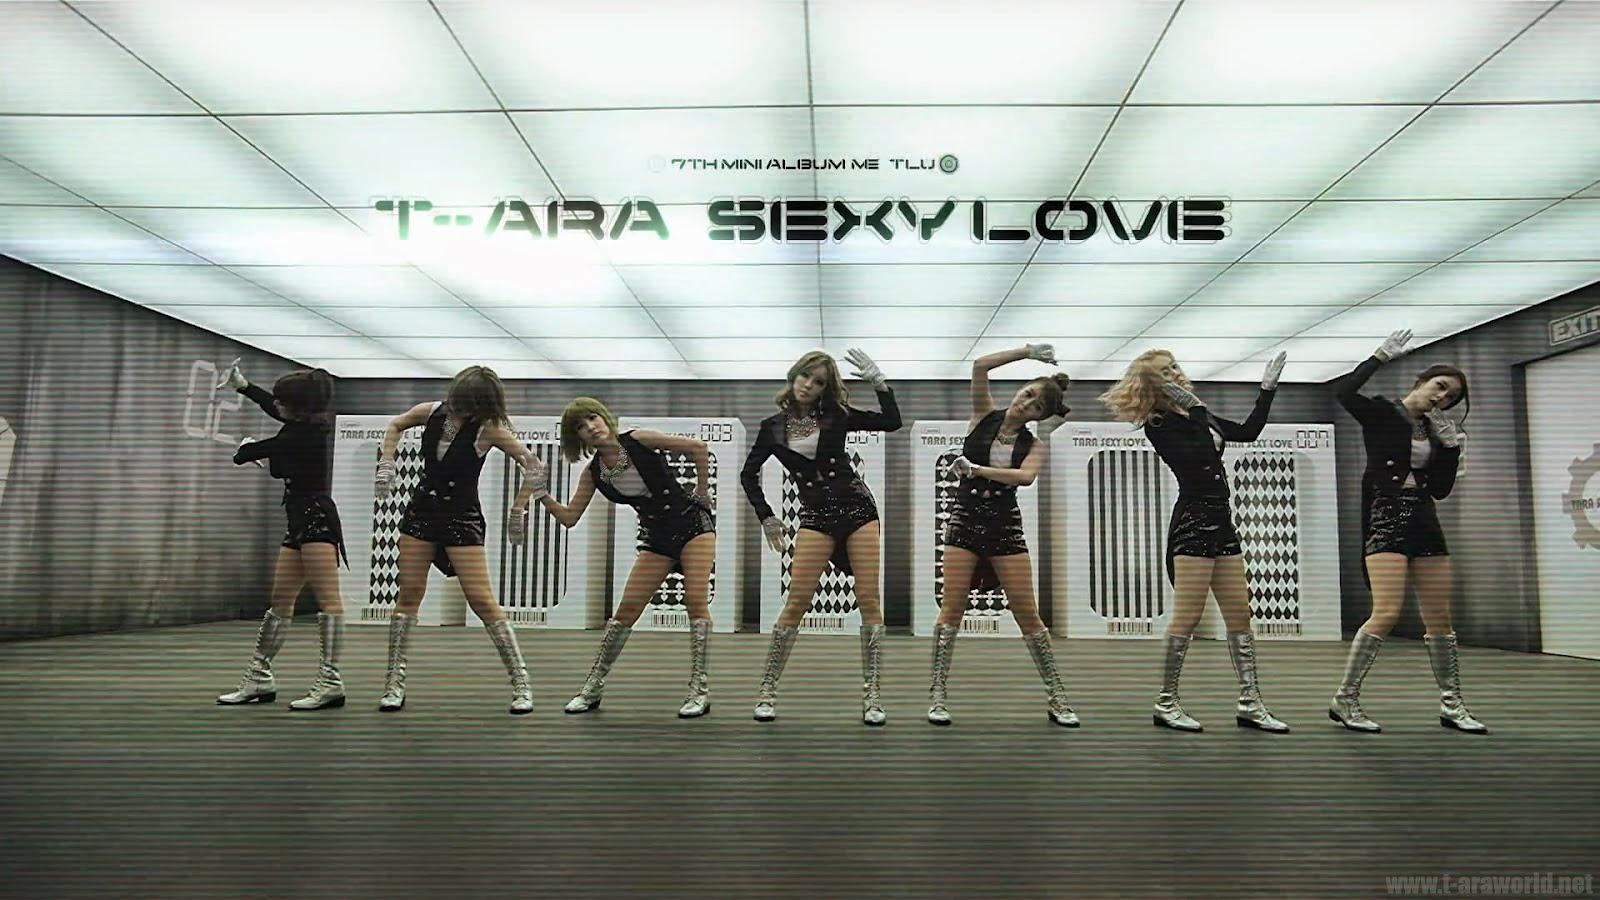 Kpop Nails | T-ara's Sexy Love